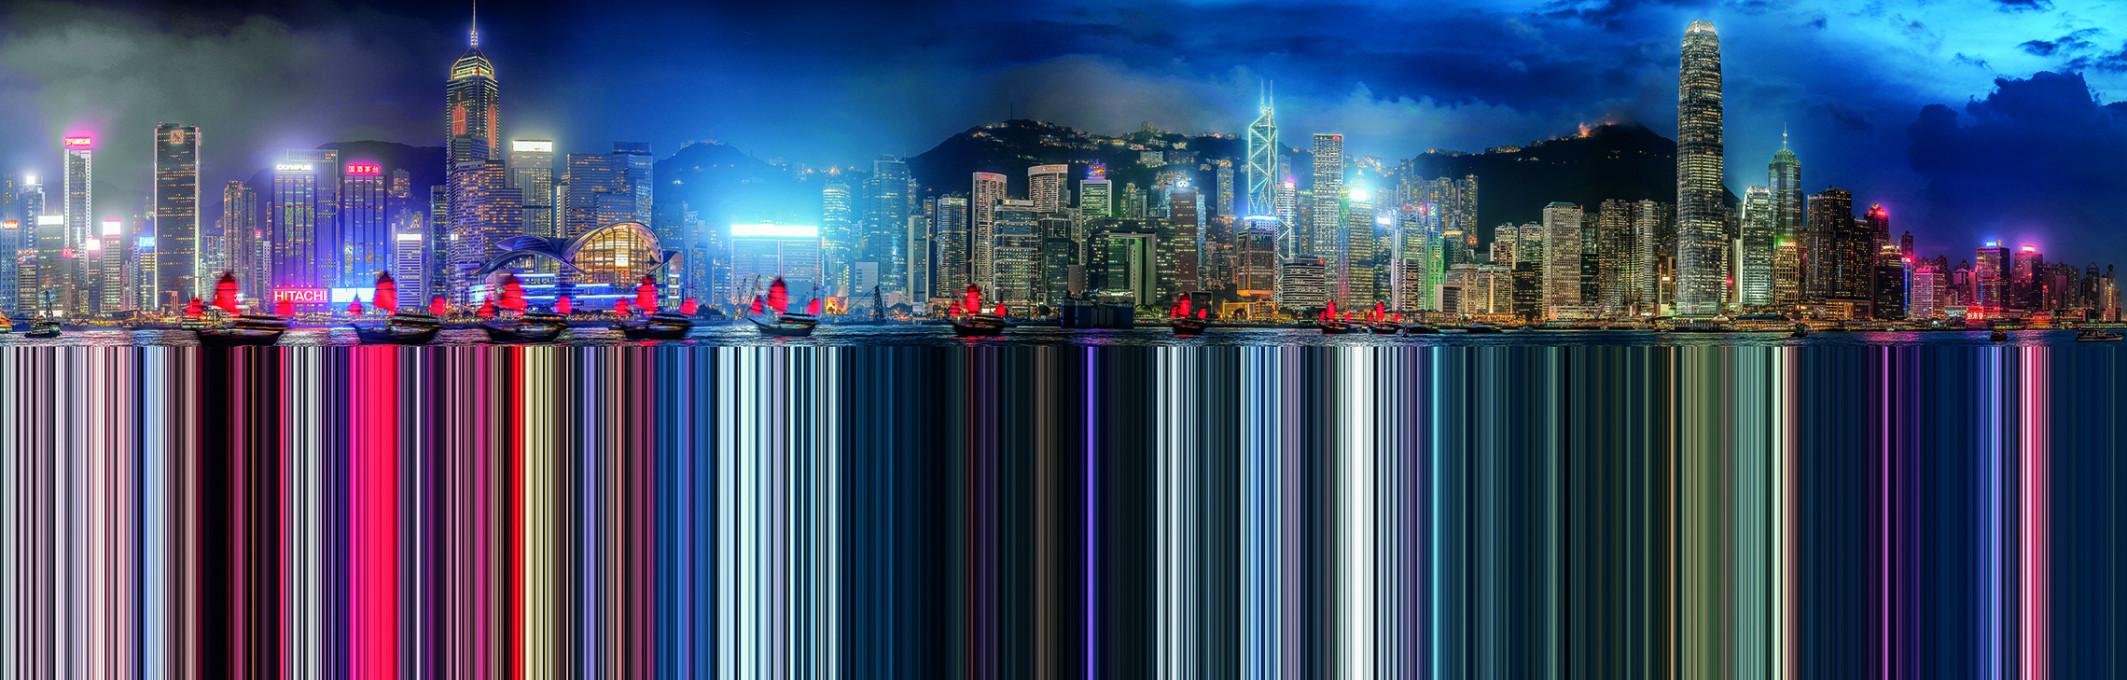 Murat Germen, Facsimile, Hong Kong #5, 2014. Muta-